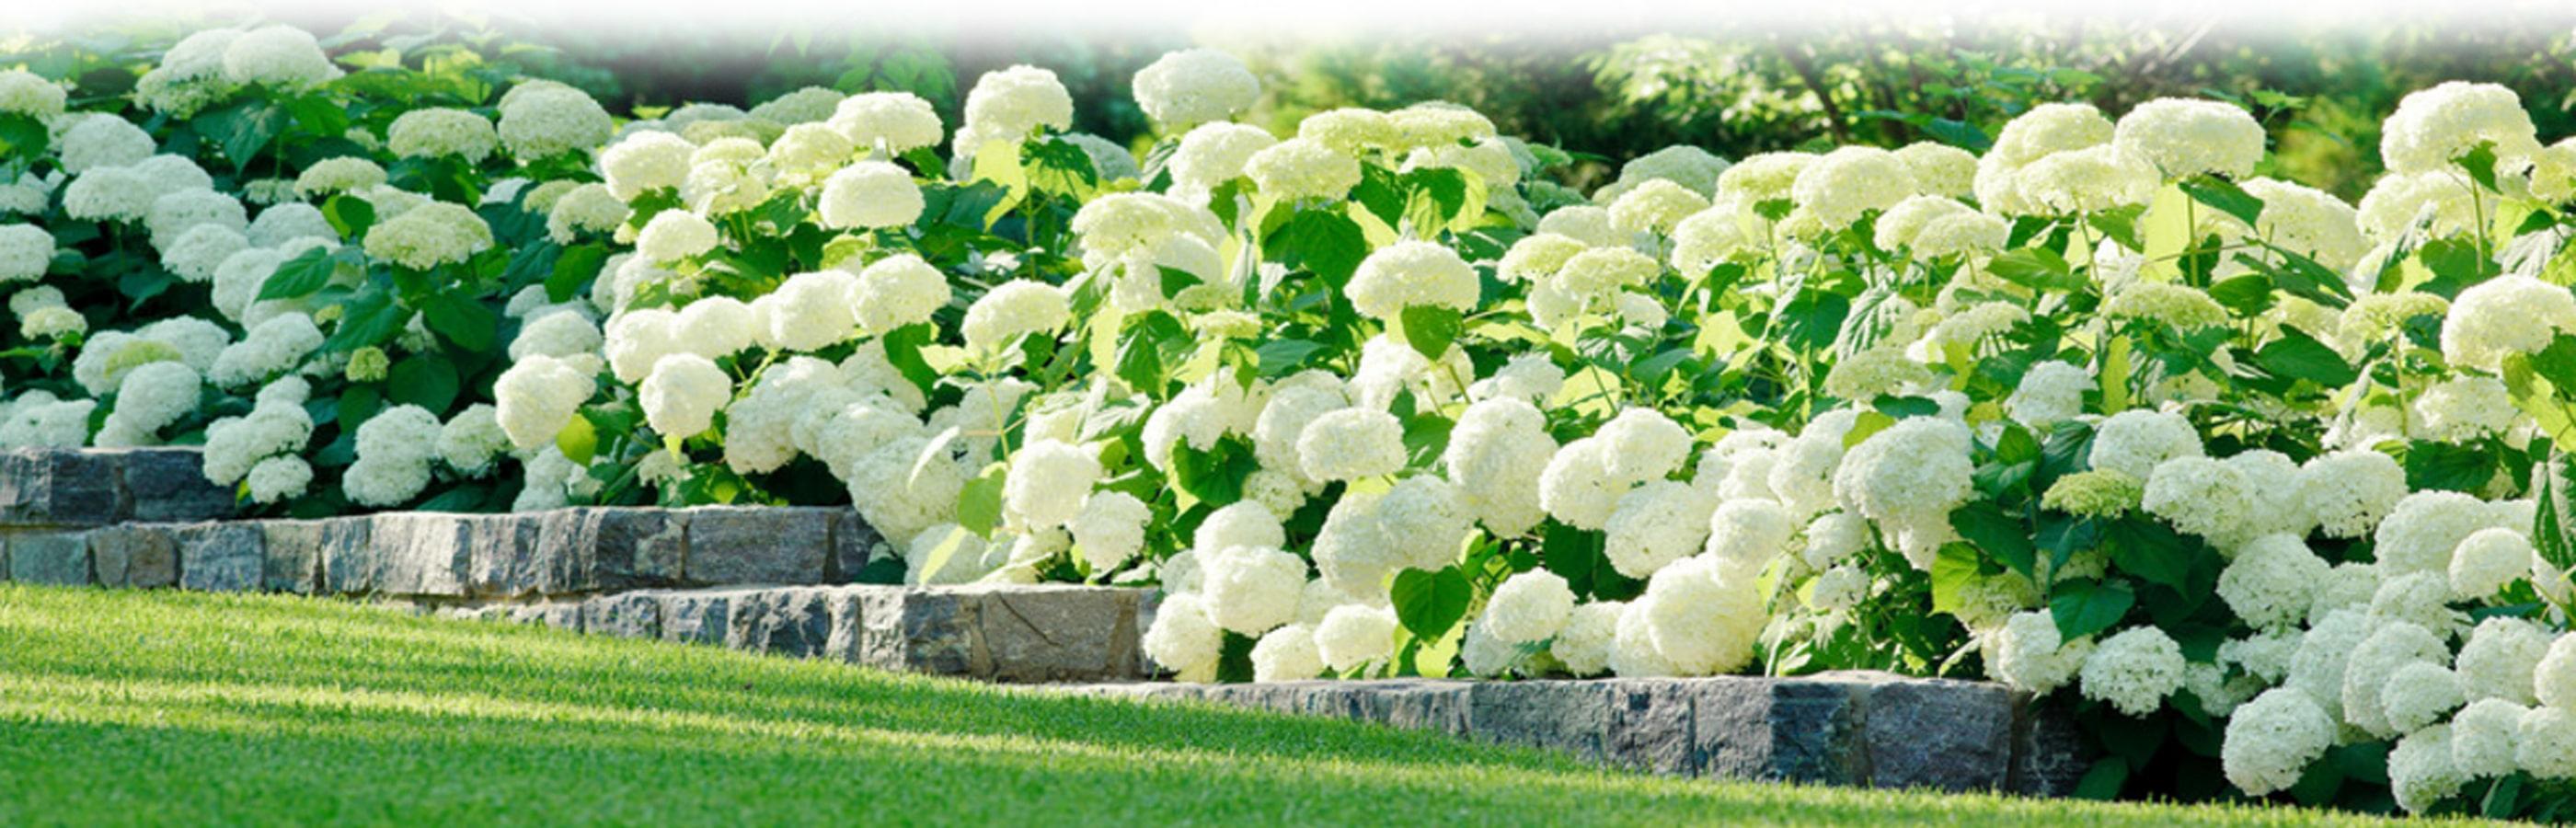 paysagiste création florale